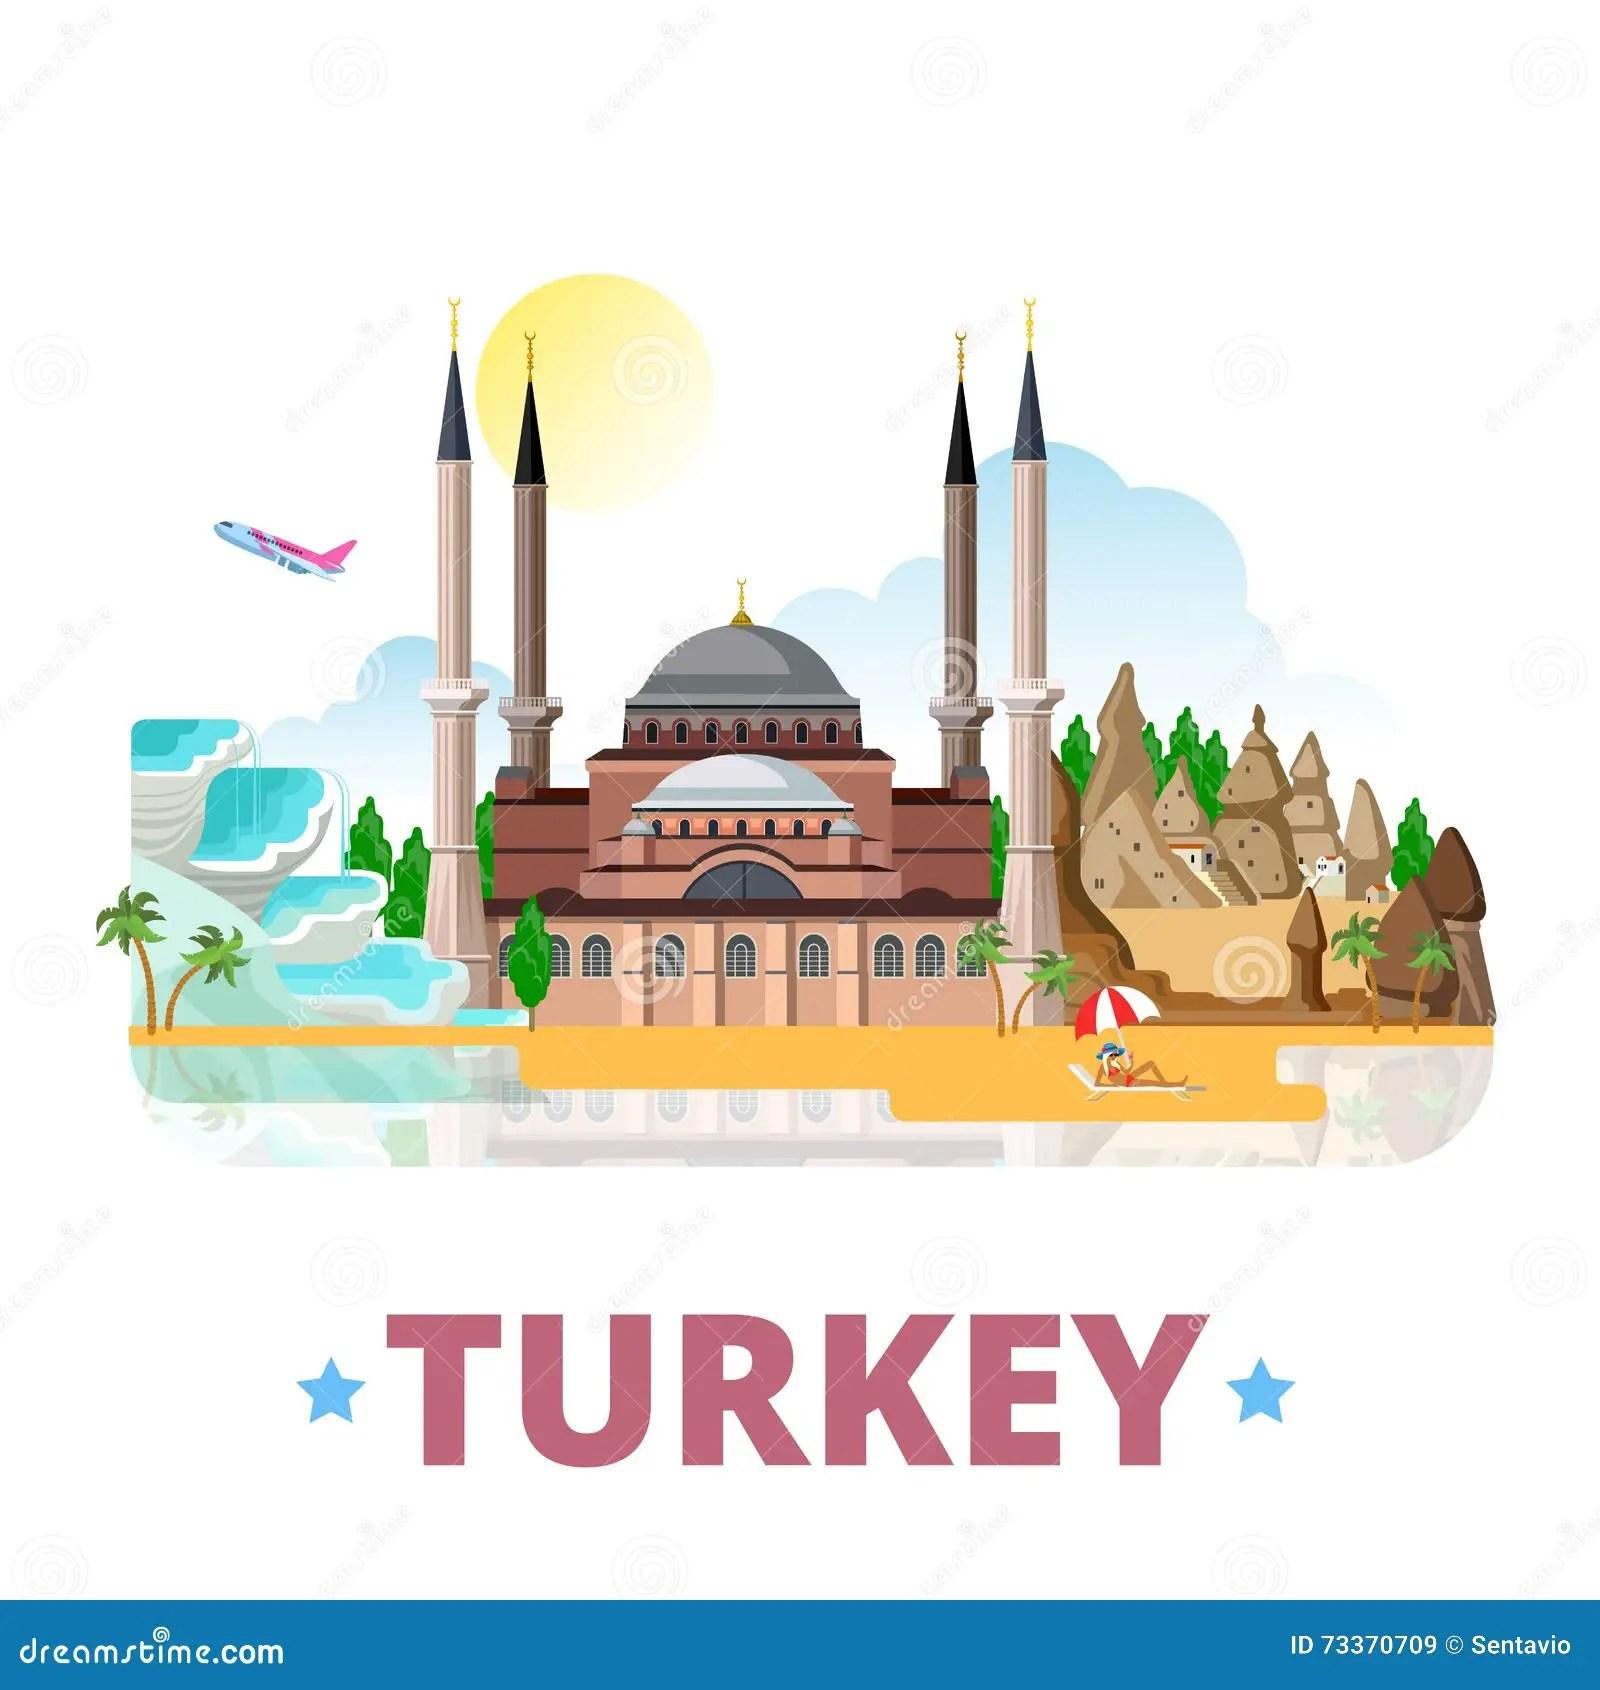 Turkey Country Design Template Flat Cartoon Style Stock